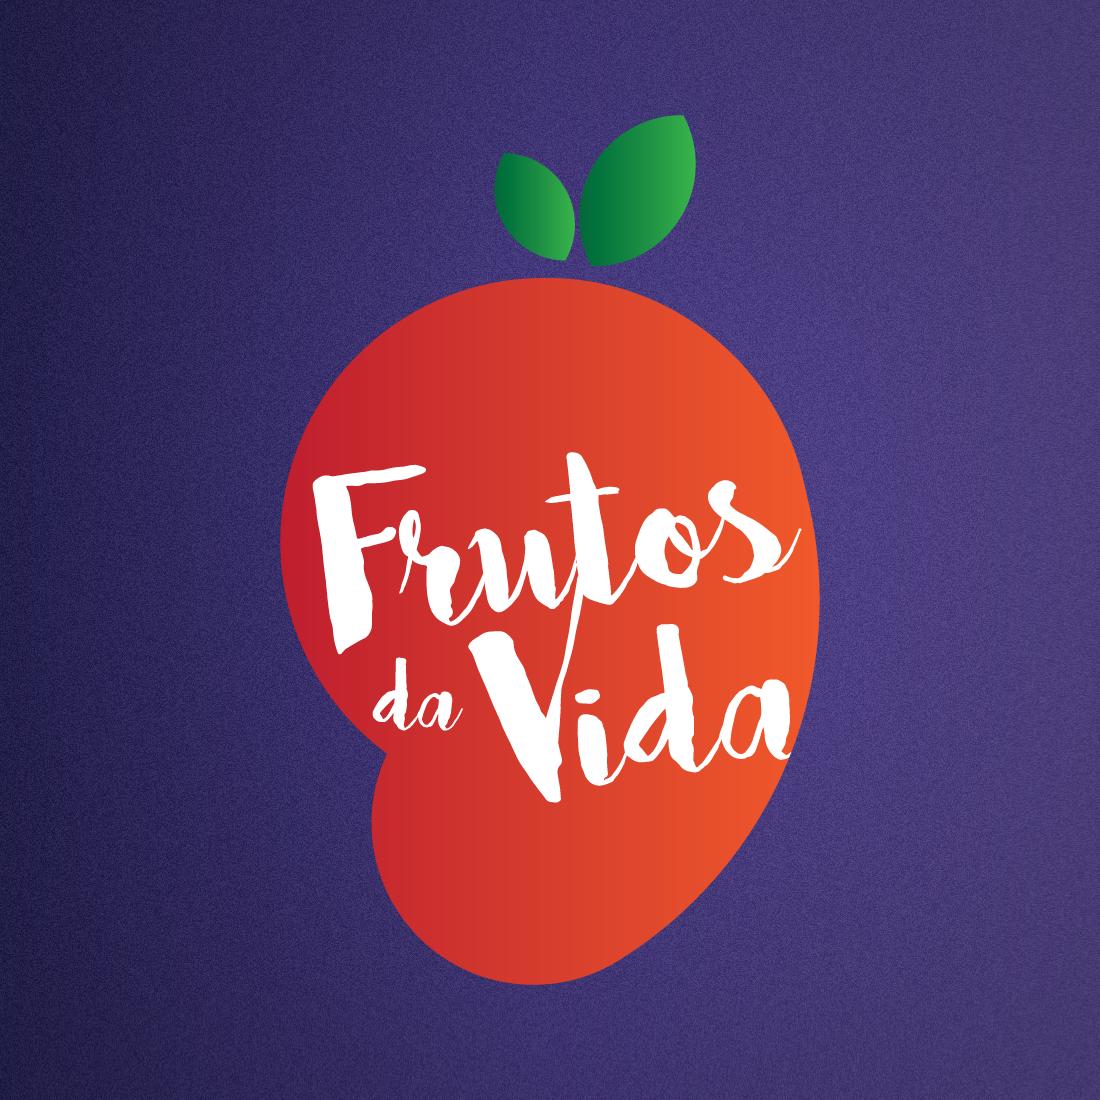 FRUTOS DA VIDA